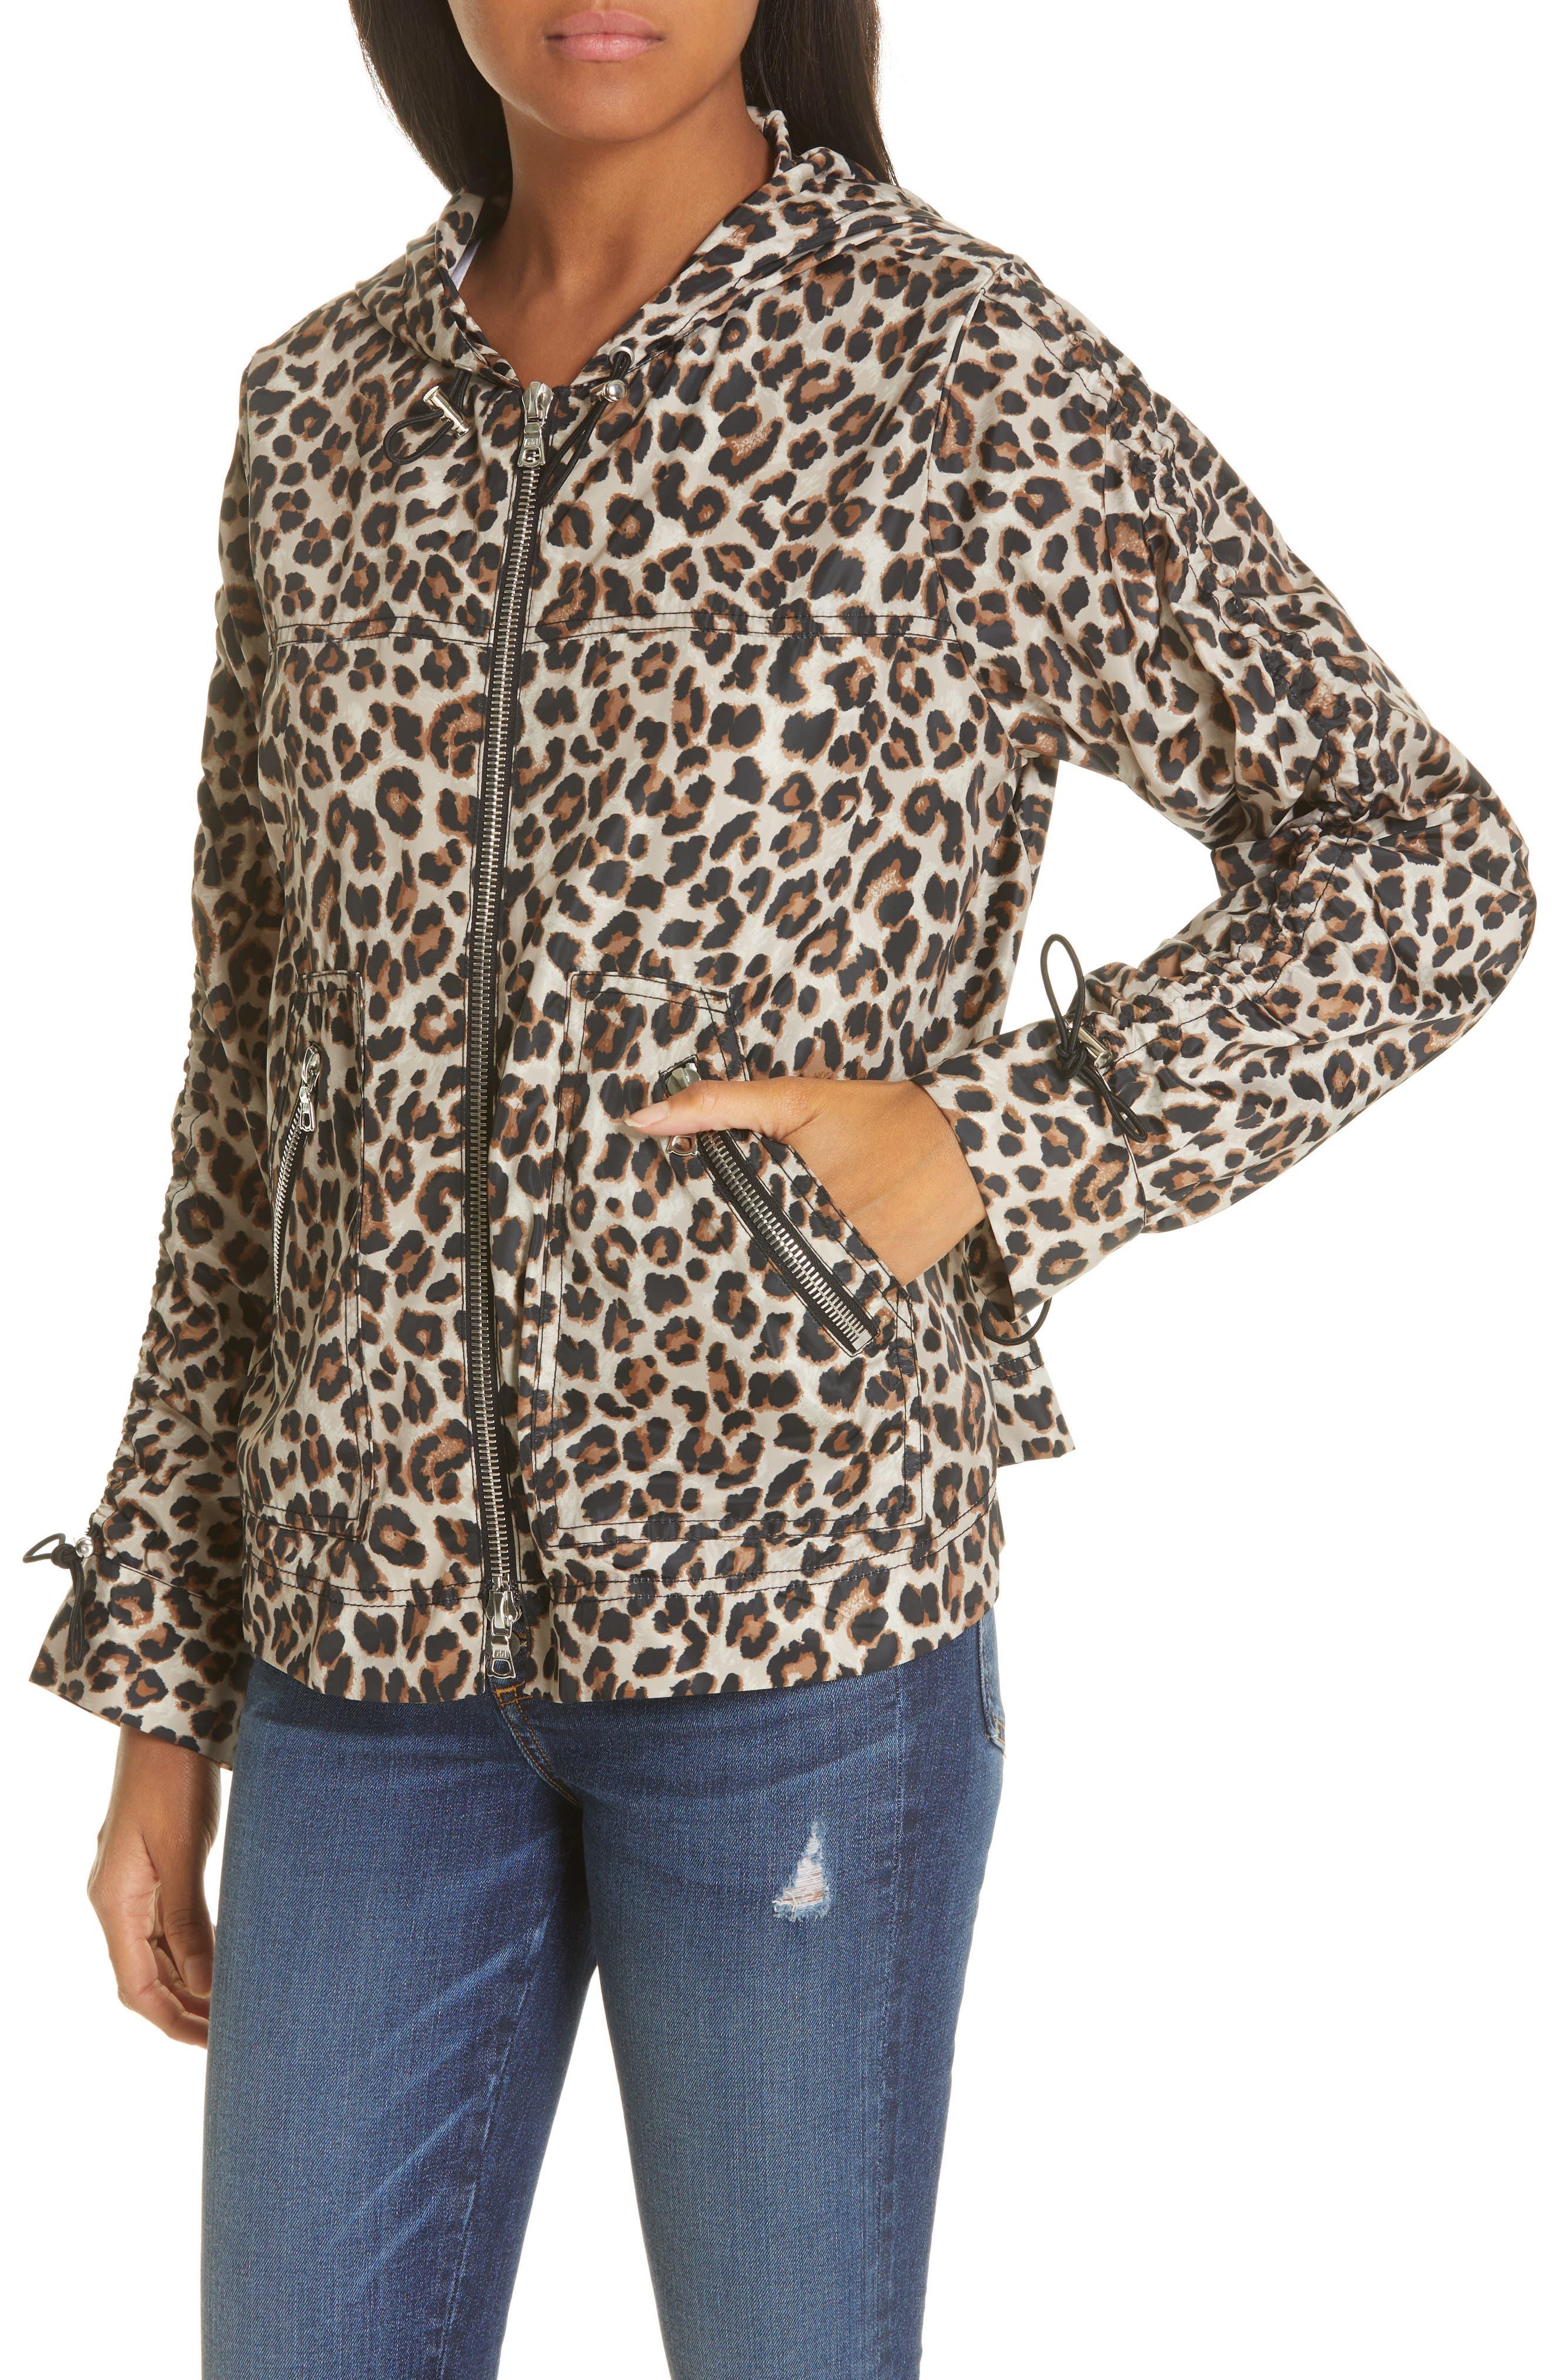 Sibila Leopard Print Jacket,                             Alternate thumbnail 4, color,                             200